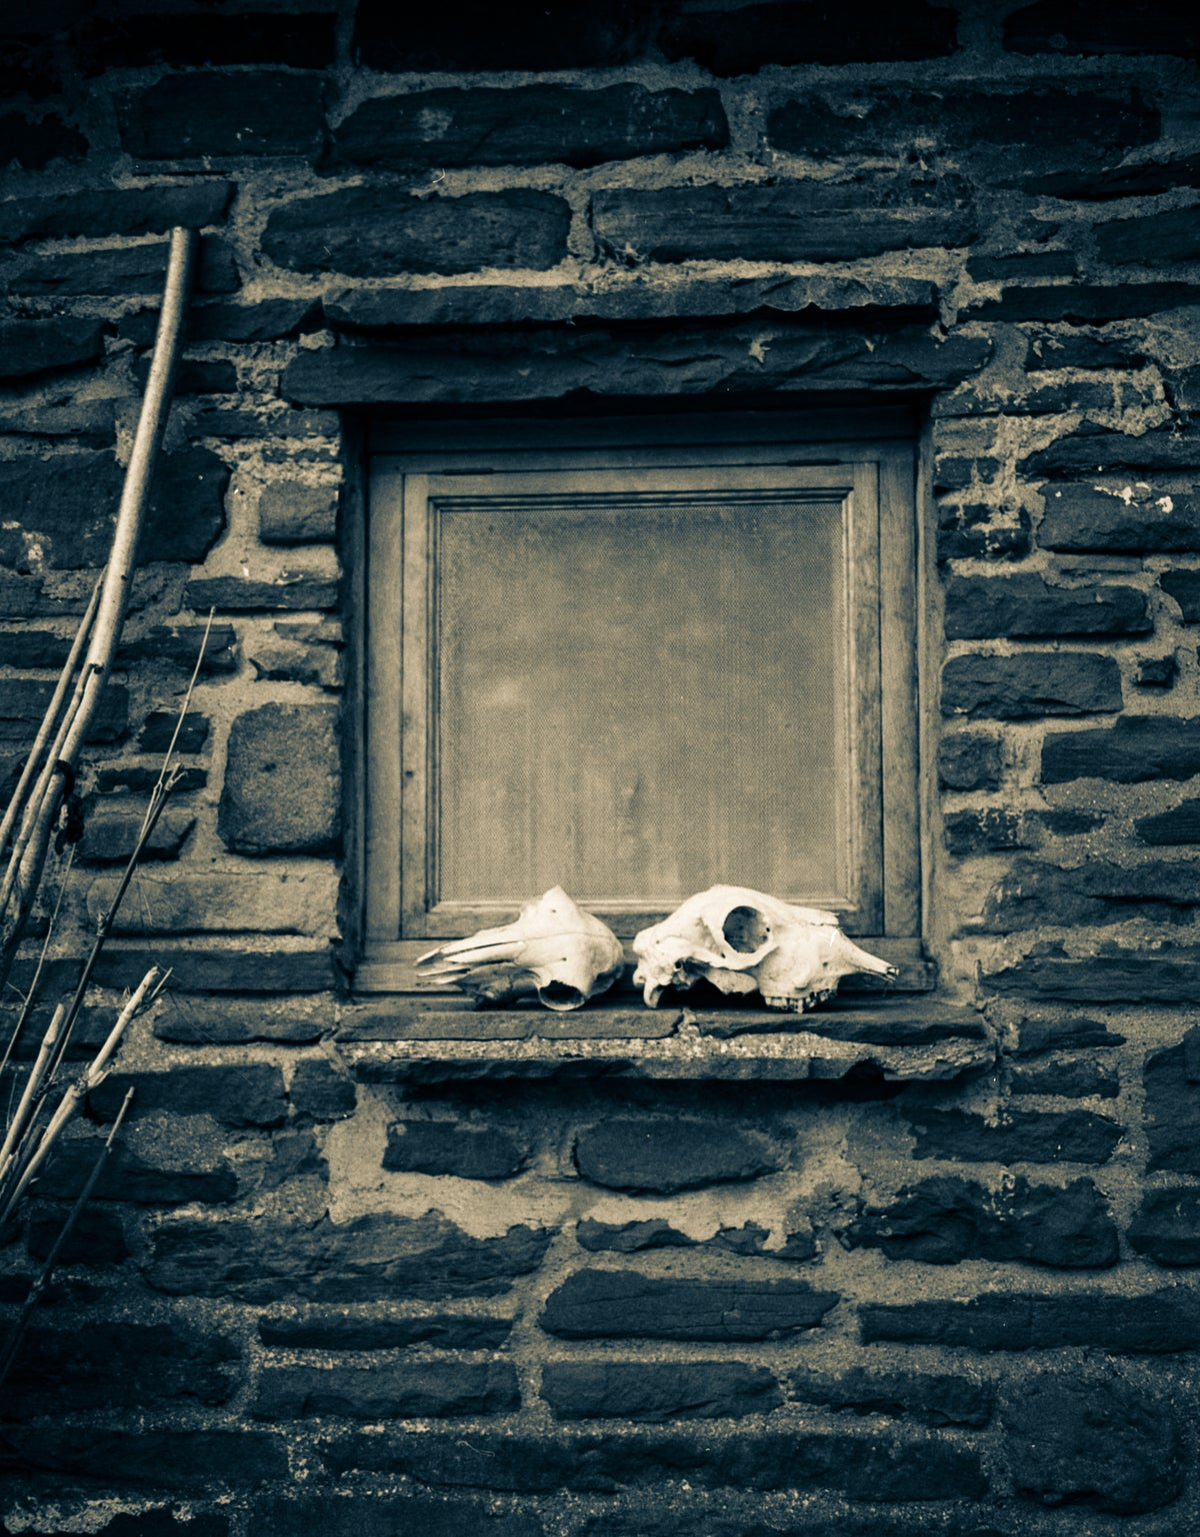 Skulls and window frame